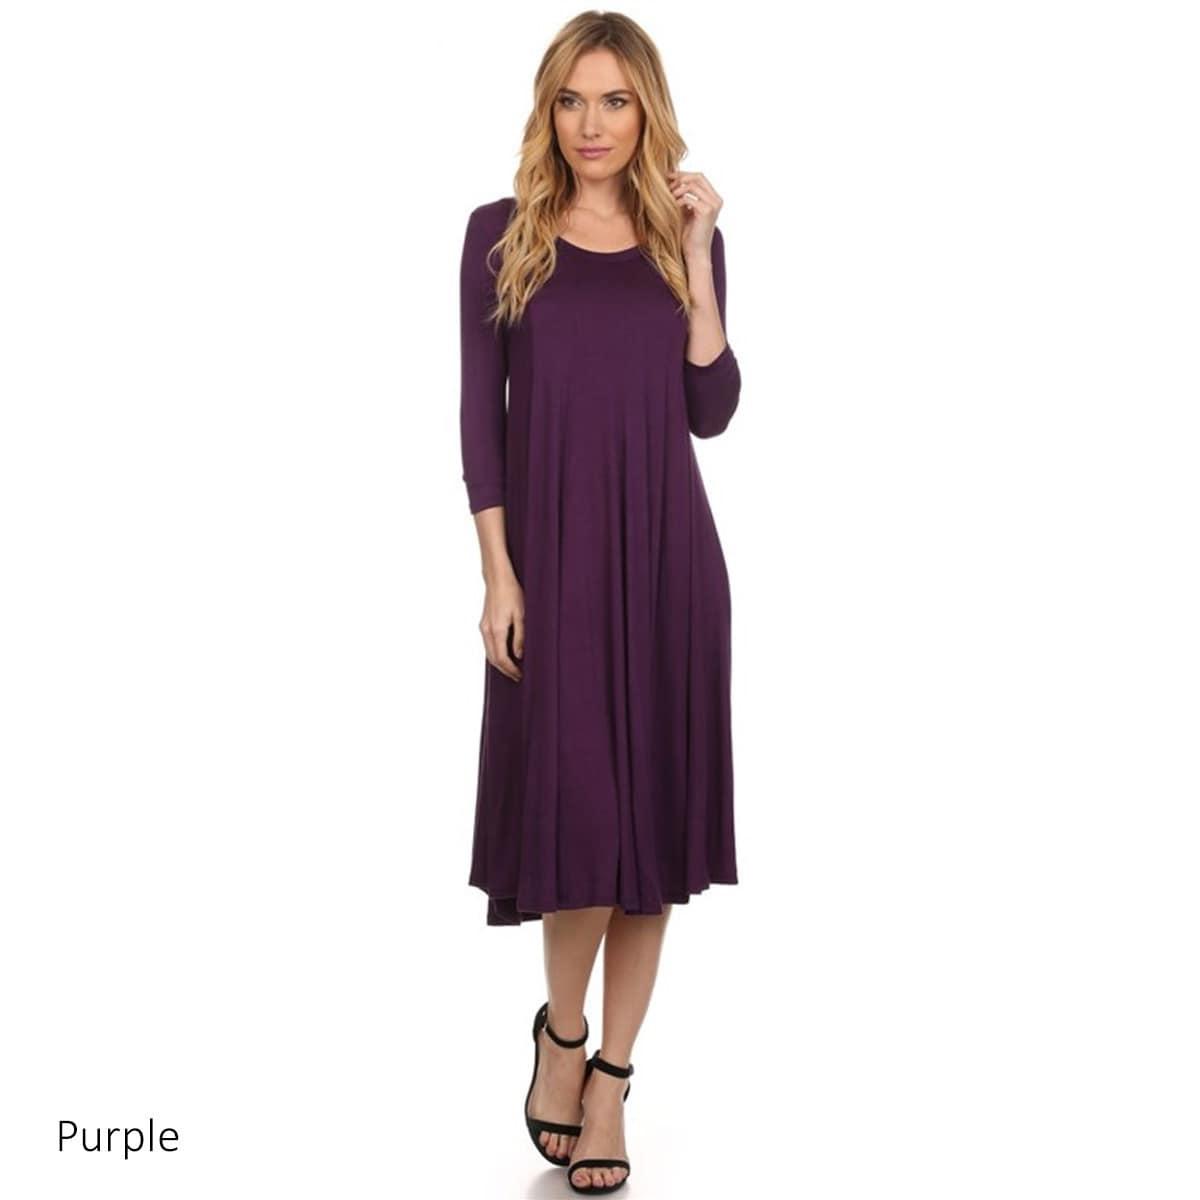 Women's Heather Rayon/Spandex Baby Doll Dress (Purple-Lar...